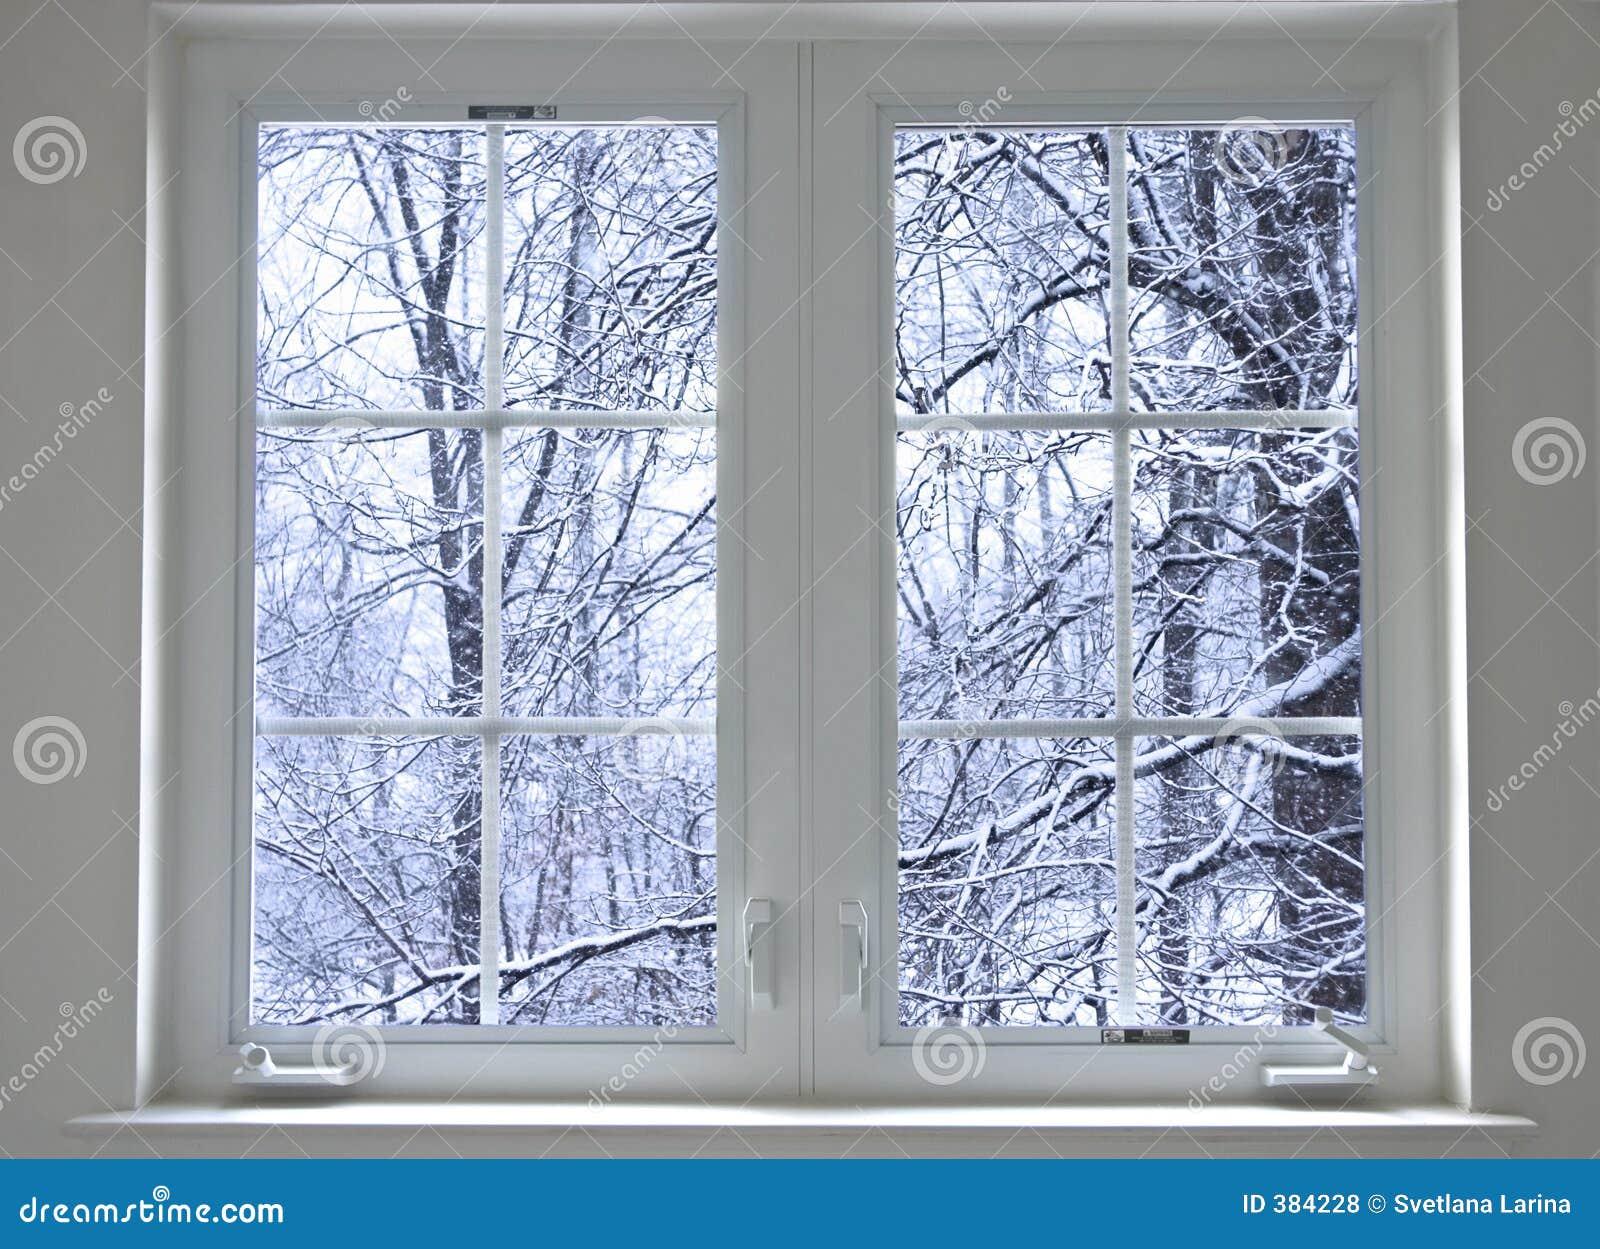 Fönstervinter